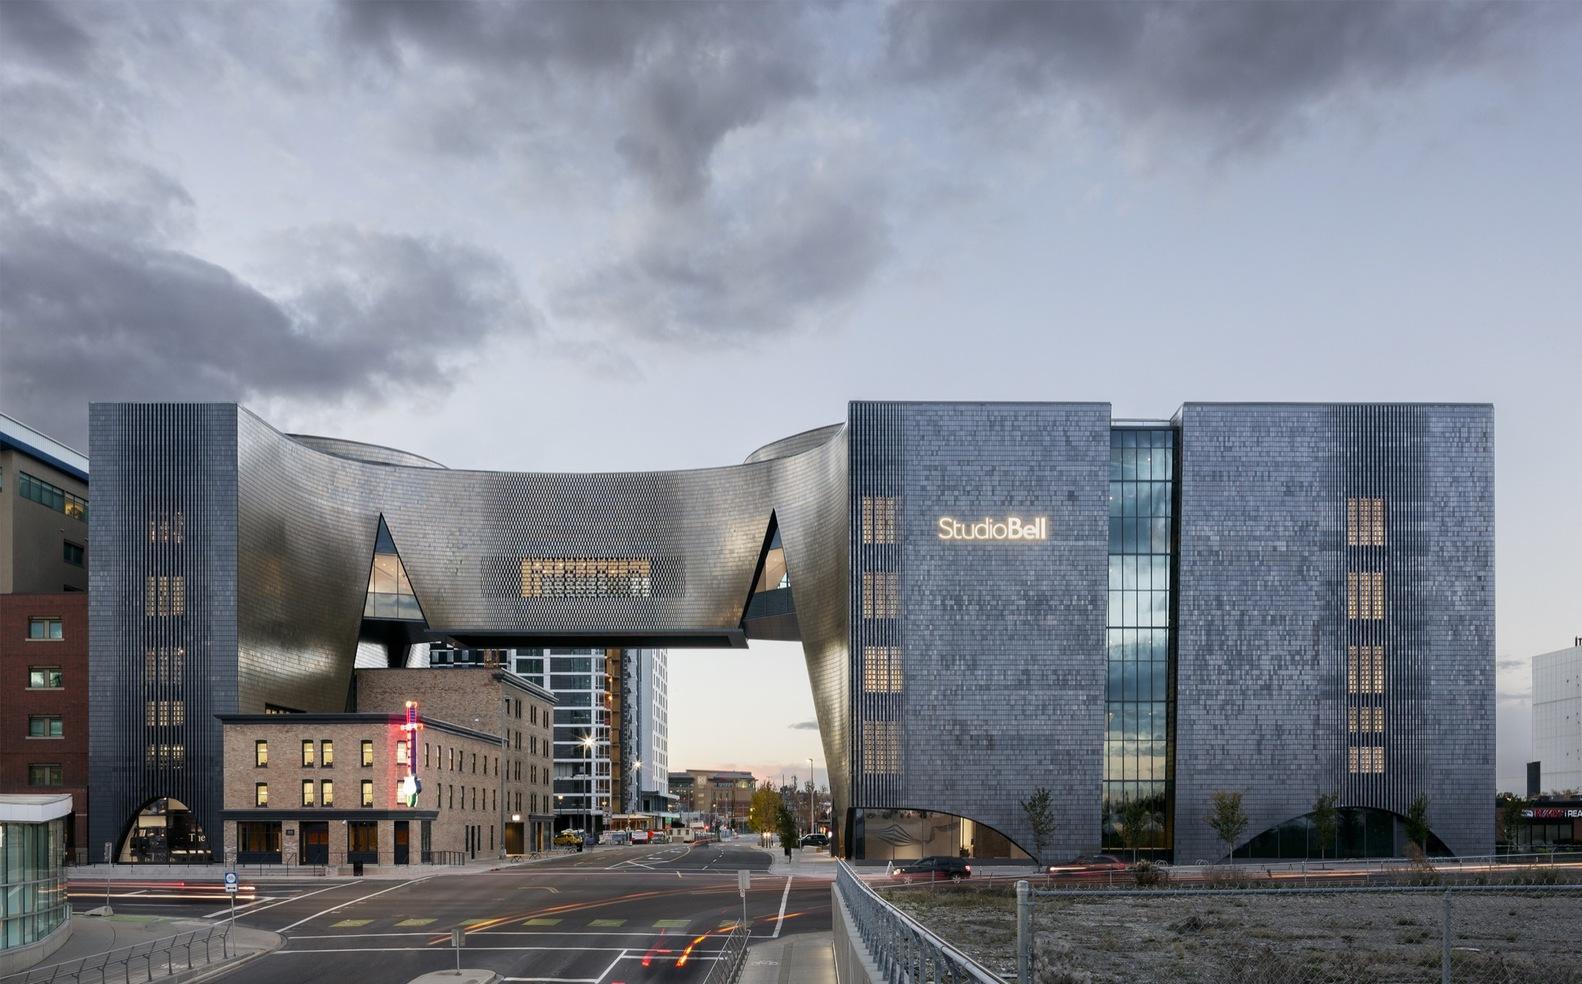 1_Studio Bell_Allied Works Architecture_Inspirationist